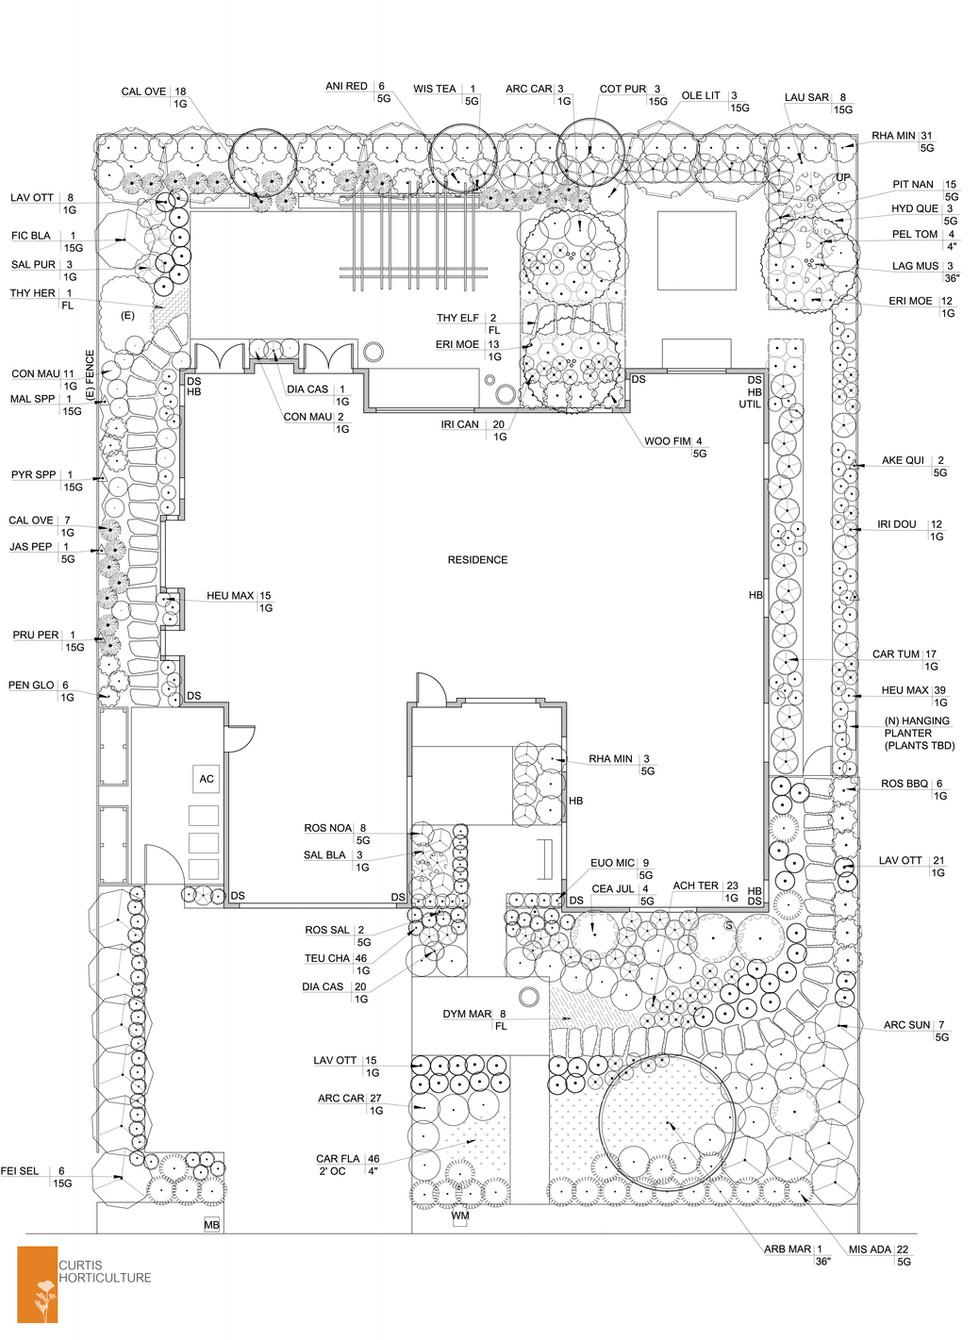 1626_BARTON_PLANTING PLAN ARCH C.jpg